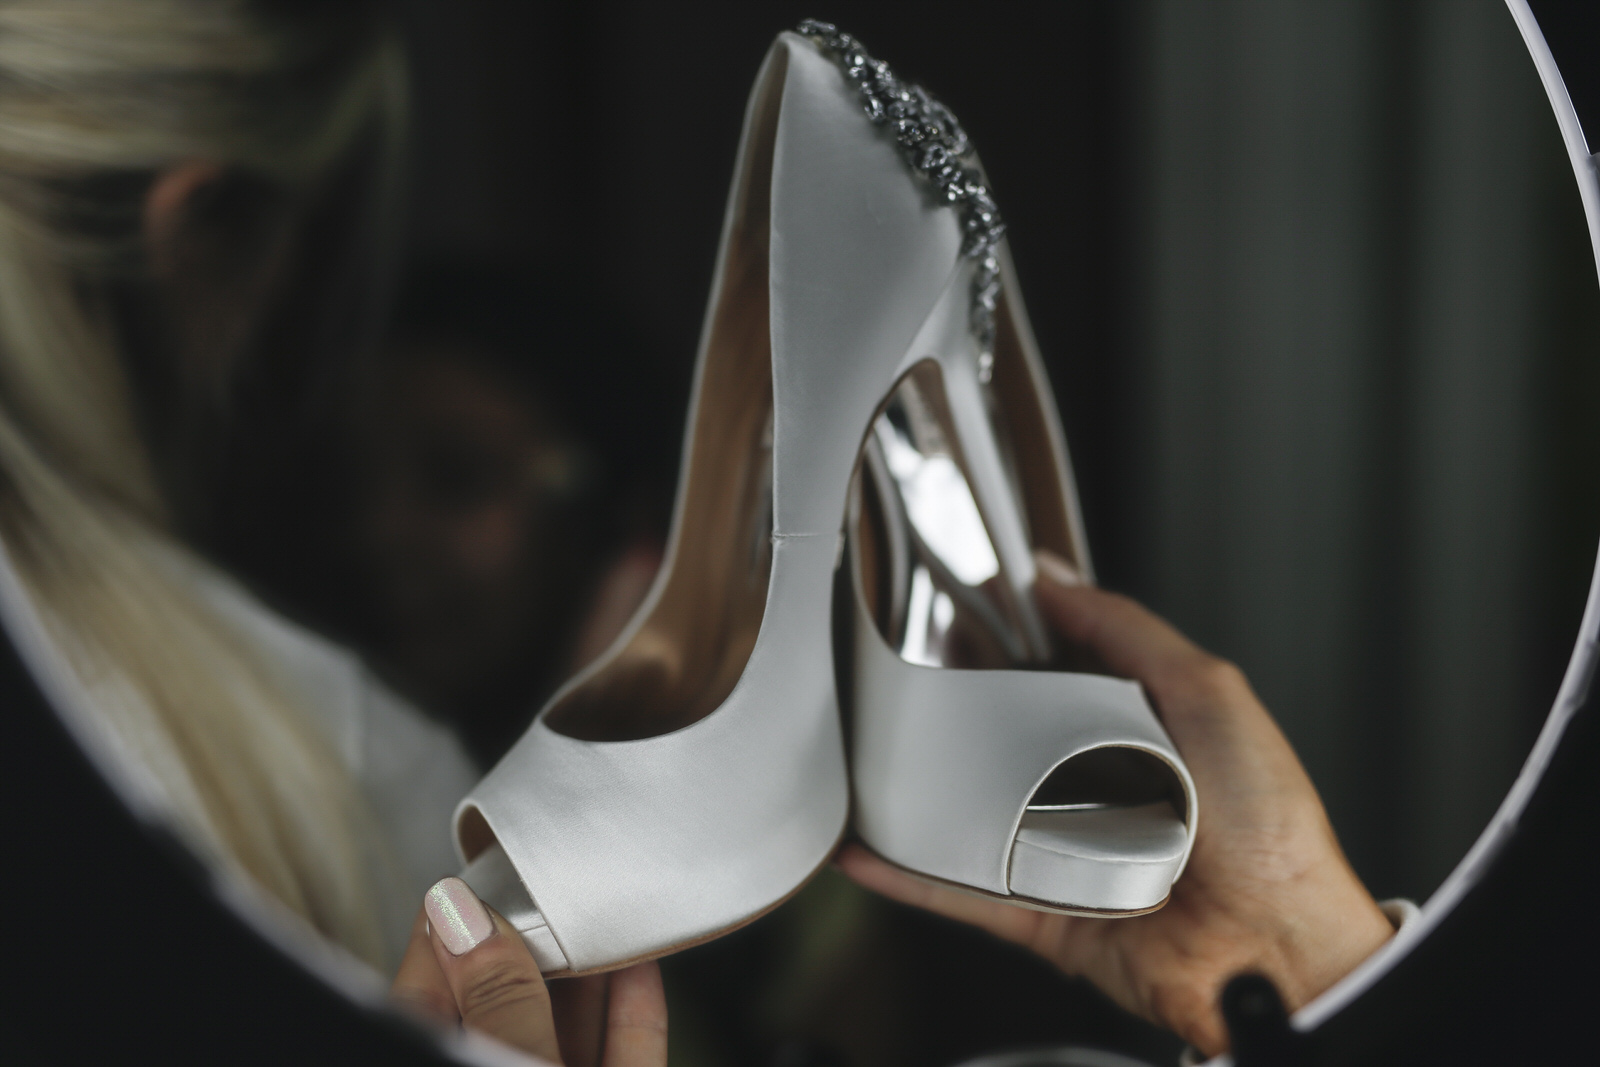 darver_castle_wedding_photographer_goldenmonentsweddingphotography_a206.jpg